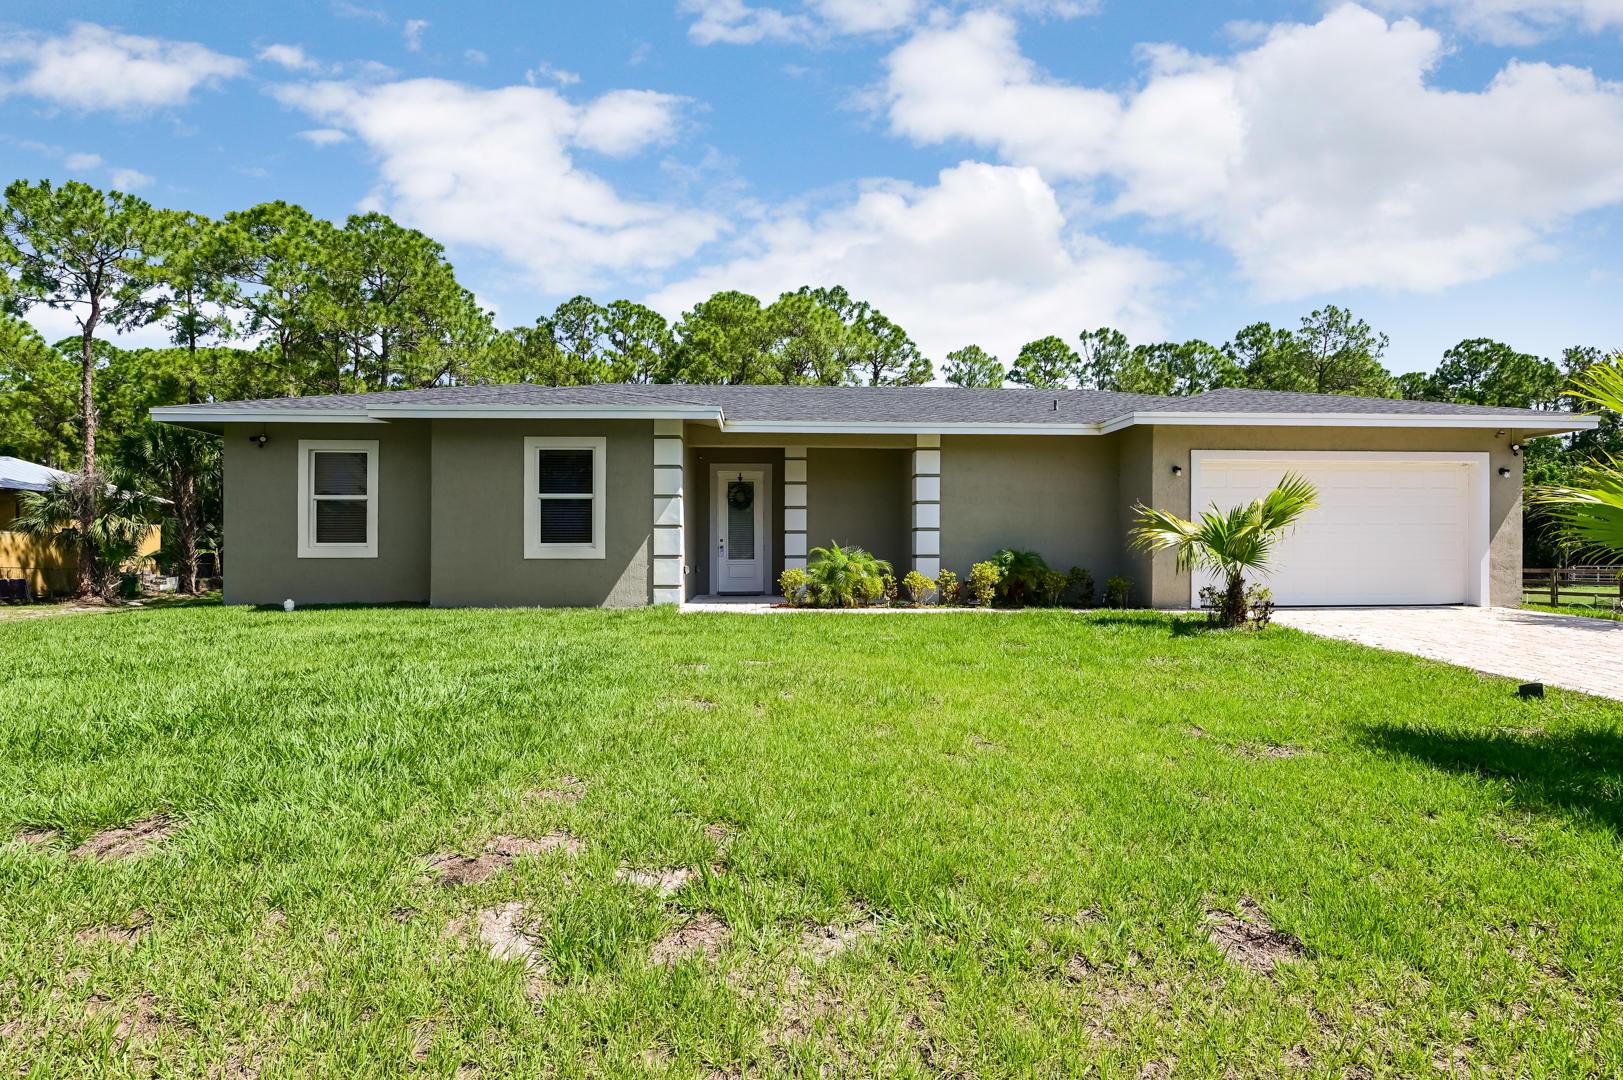 16575 69th Street N, Loxahatchee in Palm Beach County, FL 33470 Home for Sale